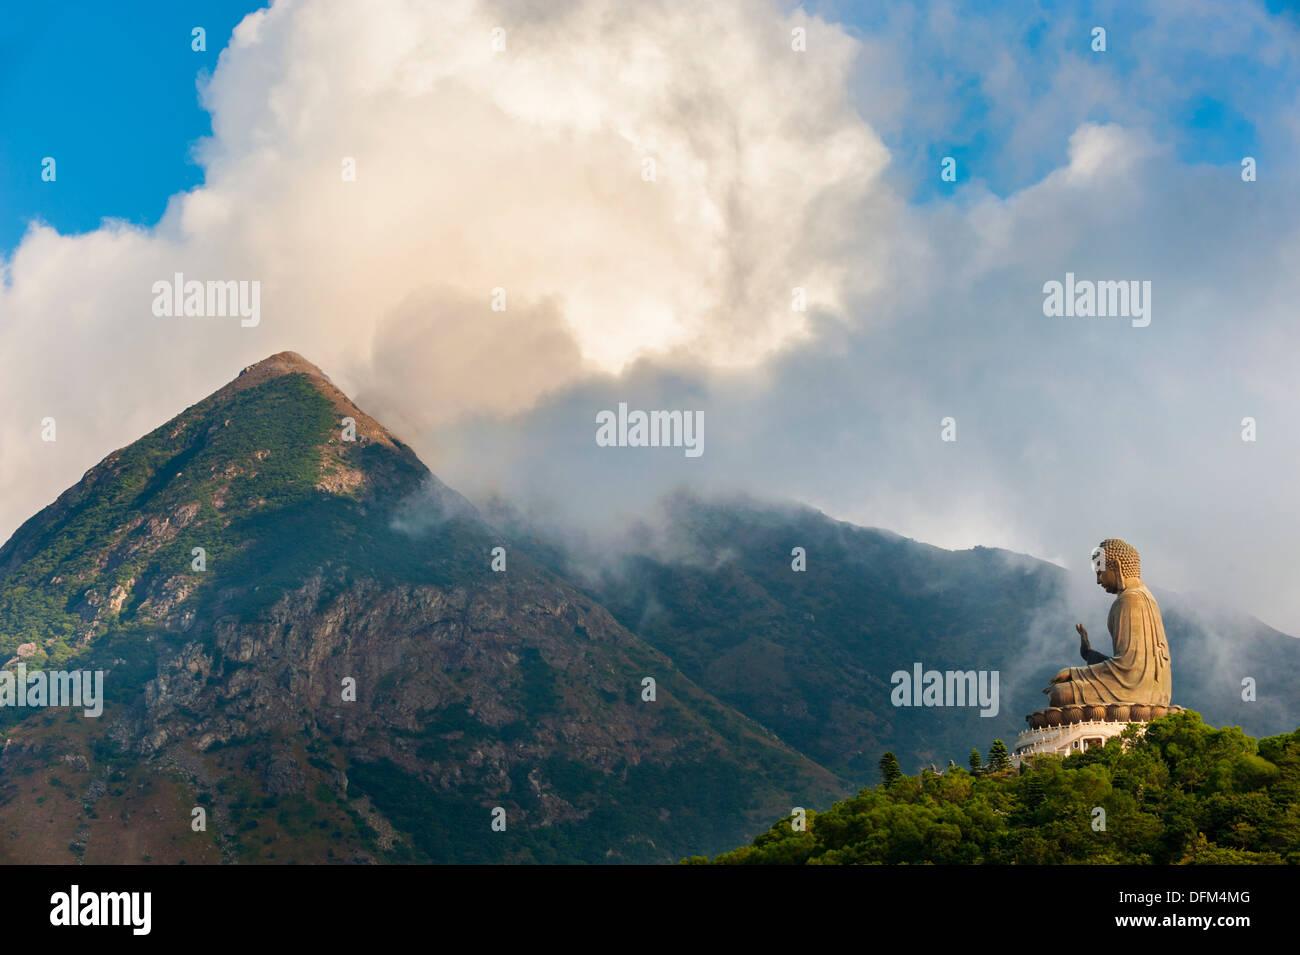 The Big Buddha at the Po Lin Monastery, Lantau Island, Hong Kong - Stock Image